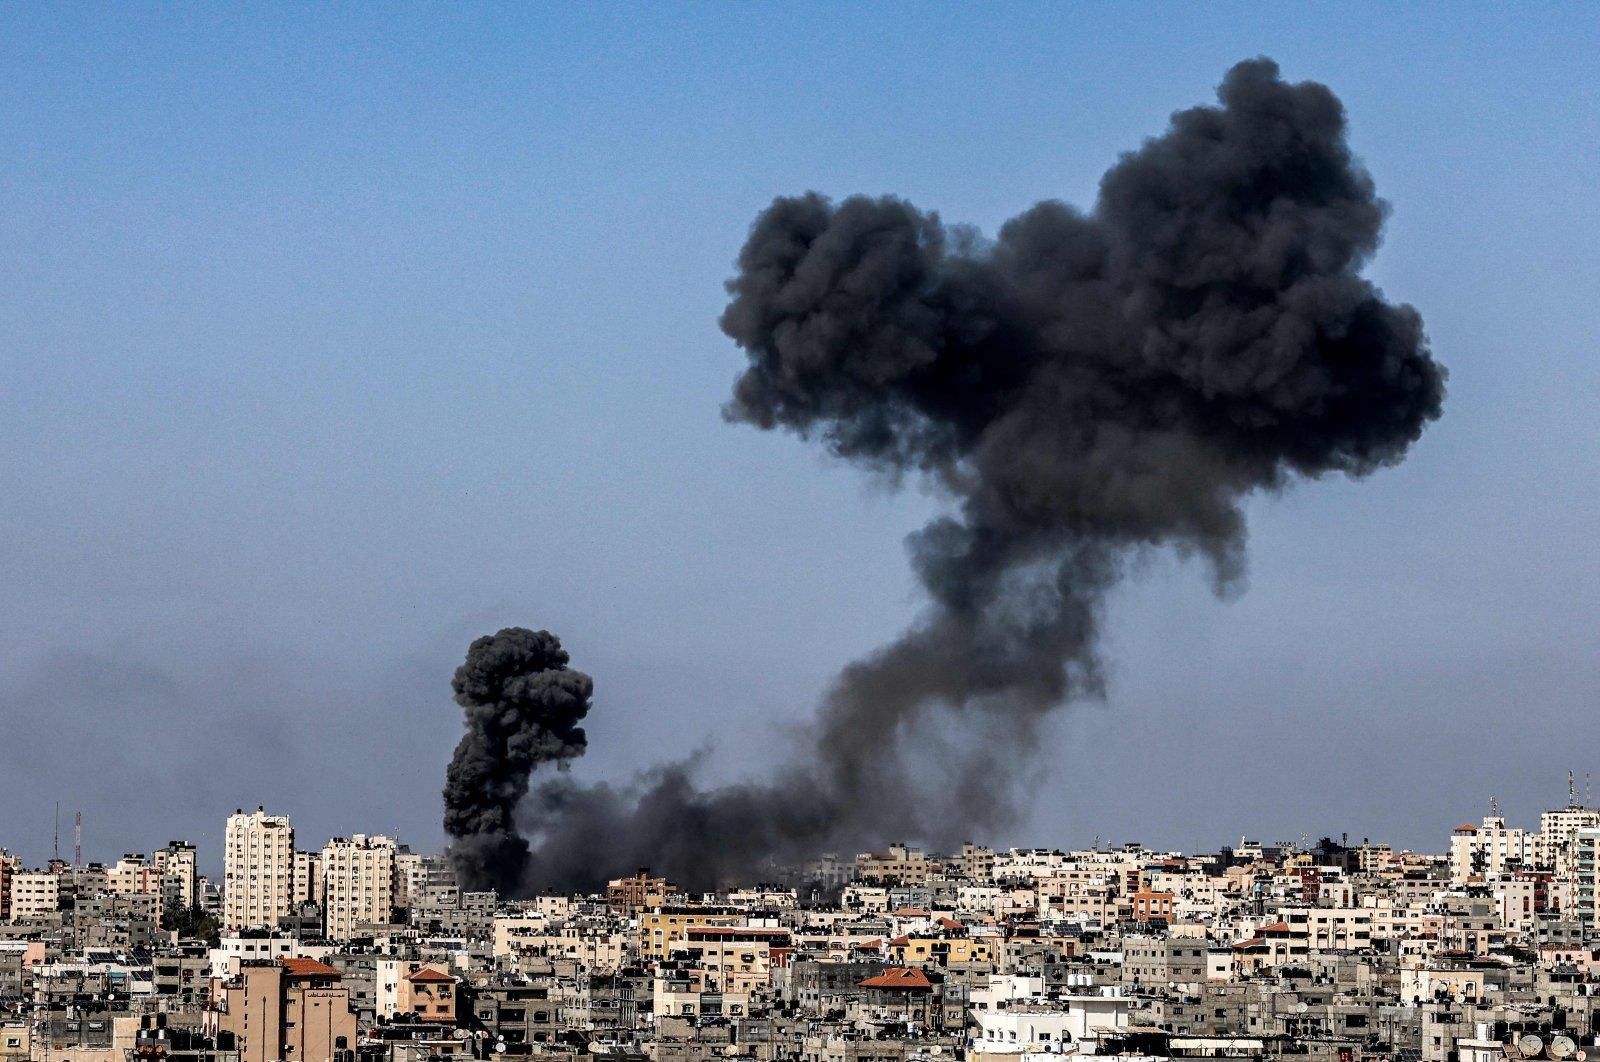 Smoke billows following Israeli airstrikes on Gaza City, Palestine on May 12, 2021. (AFP Photo)